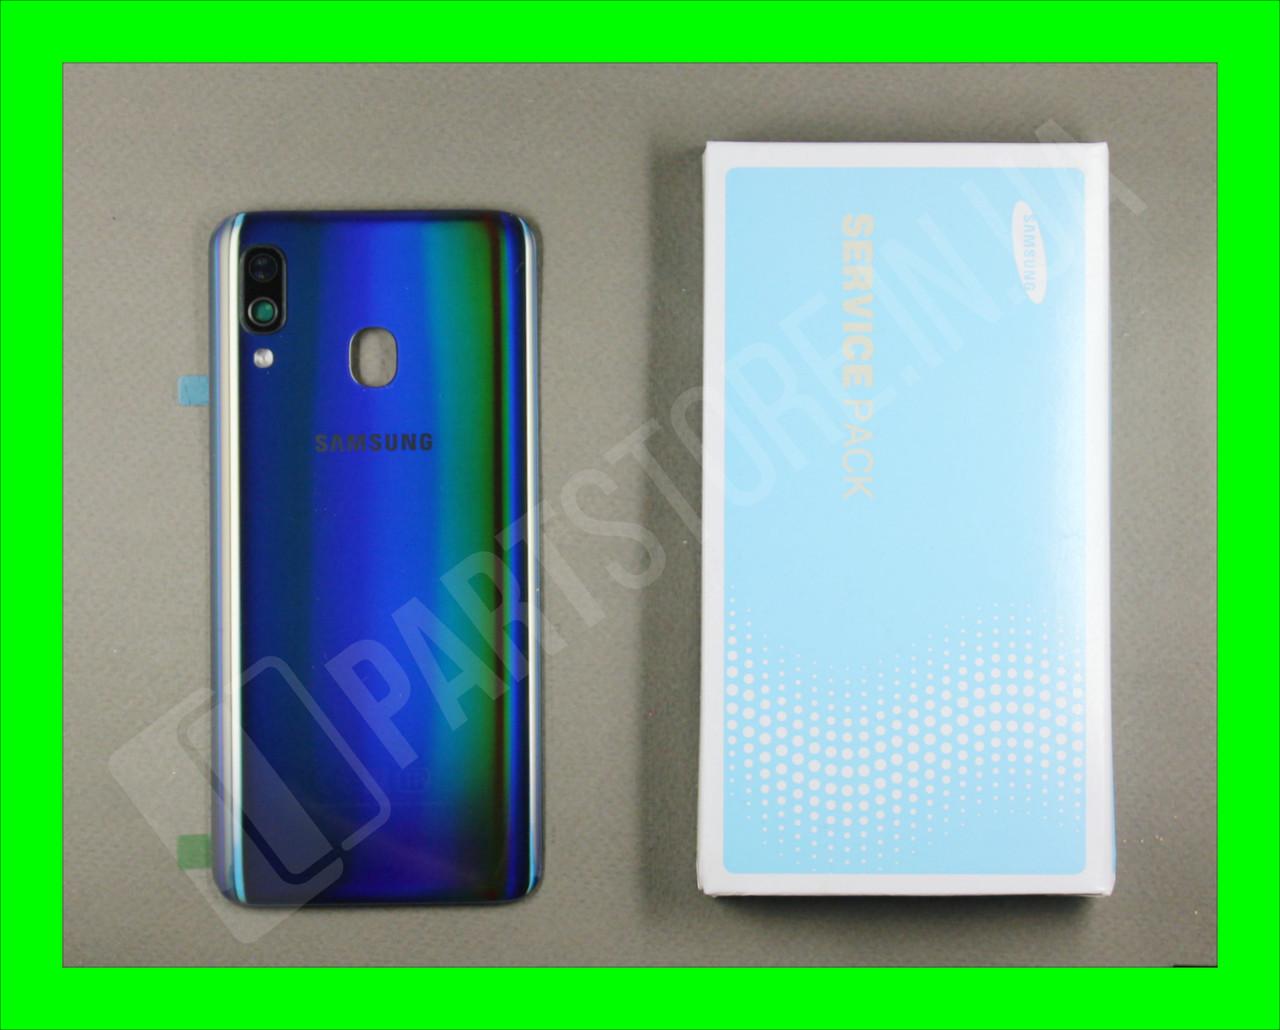 Cервисная оригинальная задняя Крышка Samsung A405 Black A40 2019 (GH82-19726A)